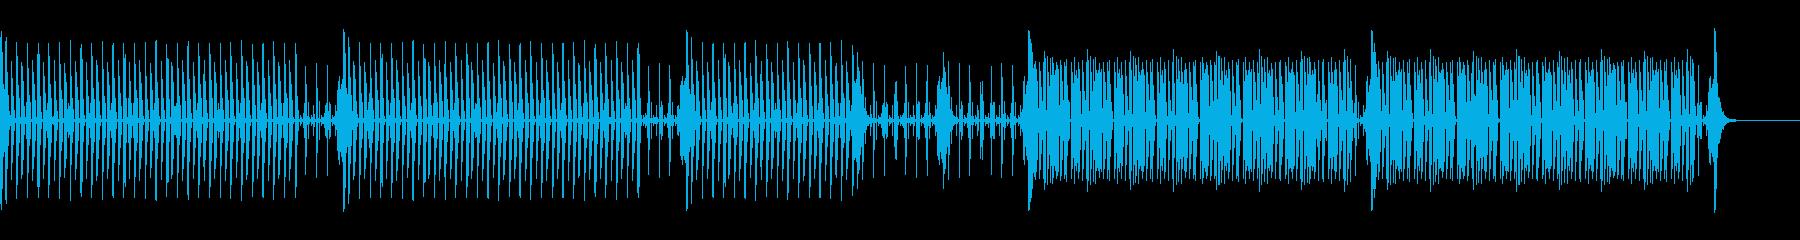 News25 Short ドラムのみの再生済みの波形